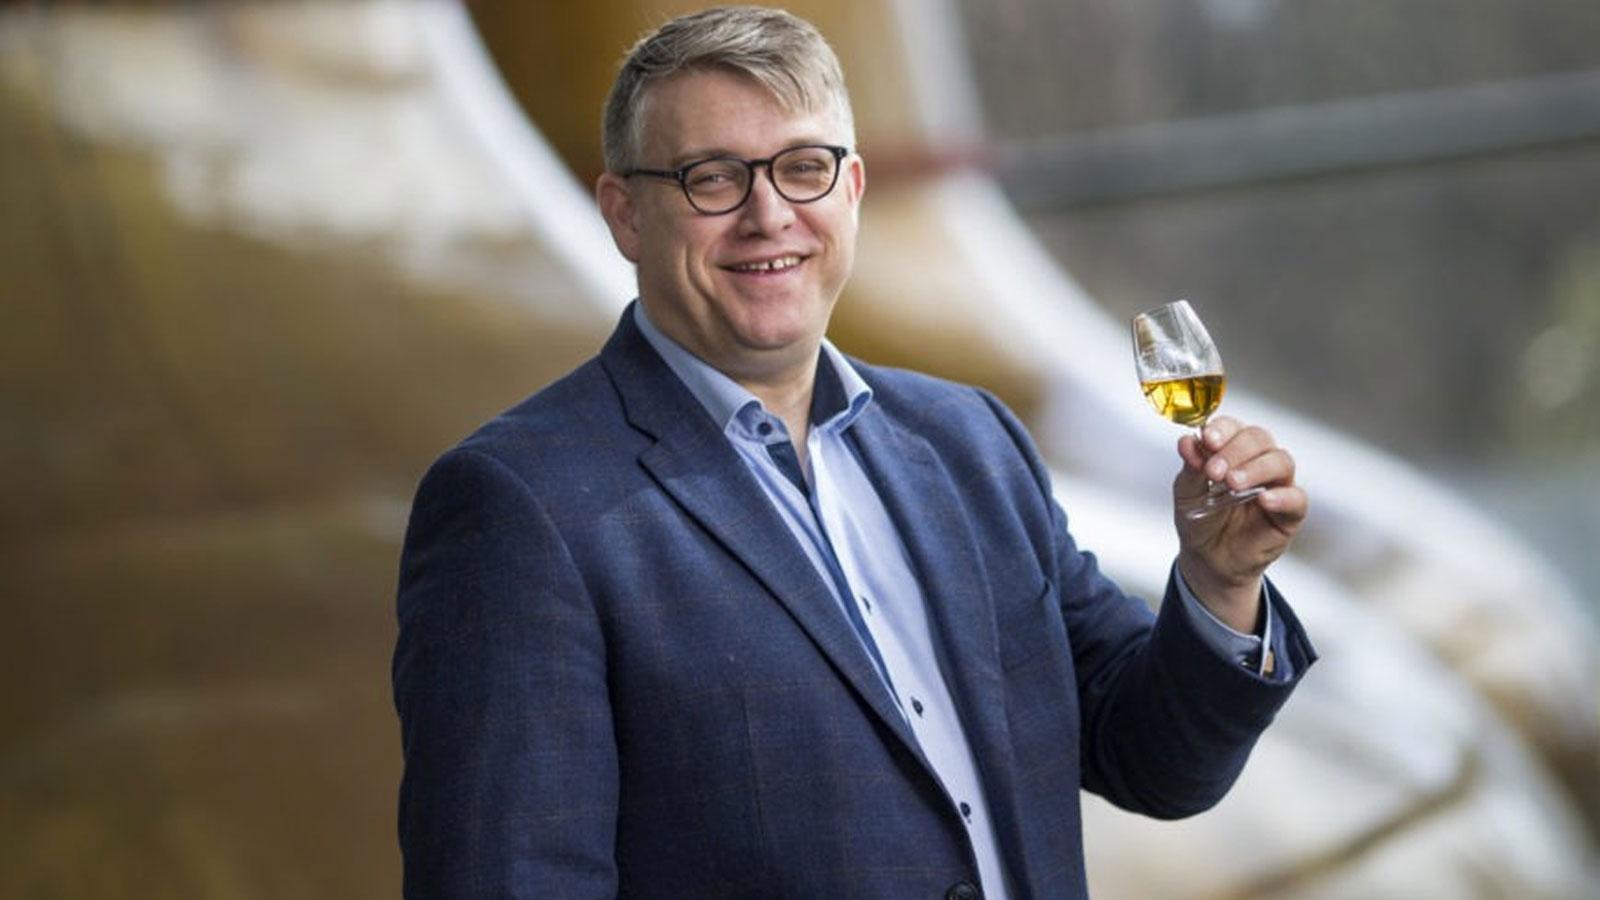 Brian Nation bei O'Shaughnessy Distilling Company weiter als Brennmeister tätig